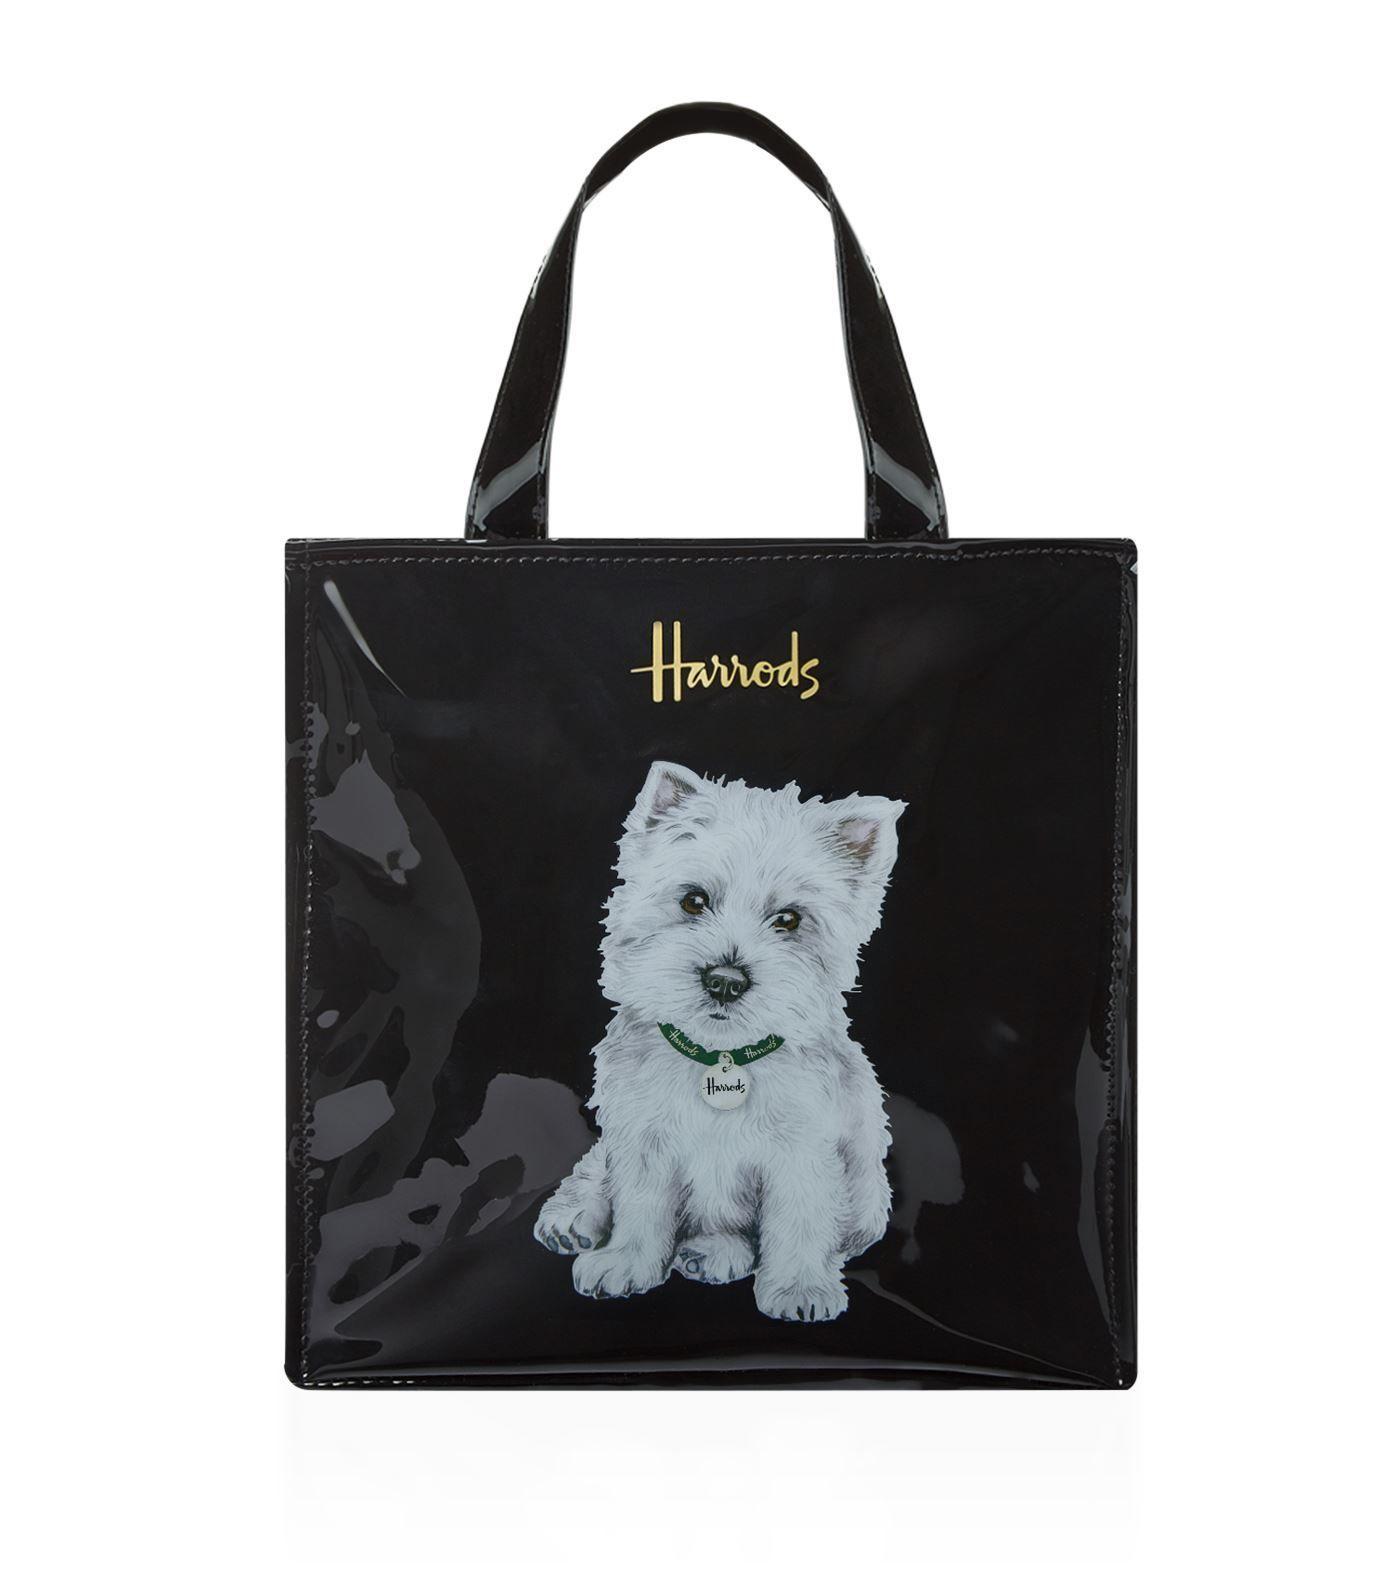 [Harrods] ハロッズ トートバッグ / ショッピングバッグ - Sサイズ  (ウェスティ / Westie PuppySmall)